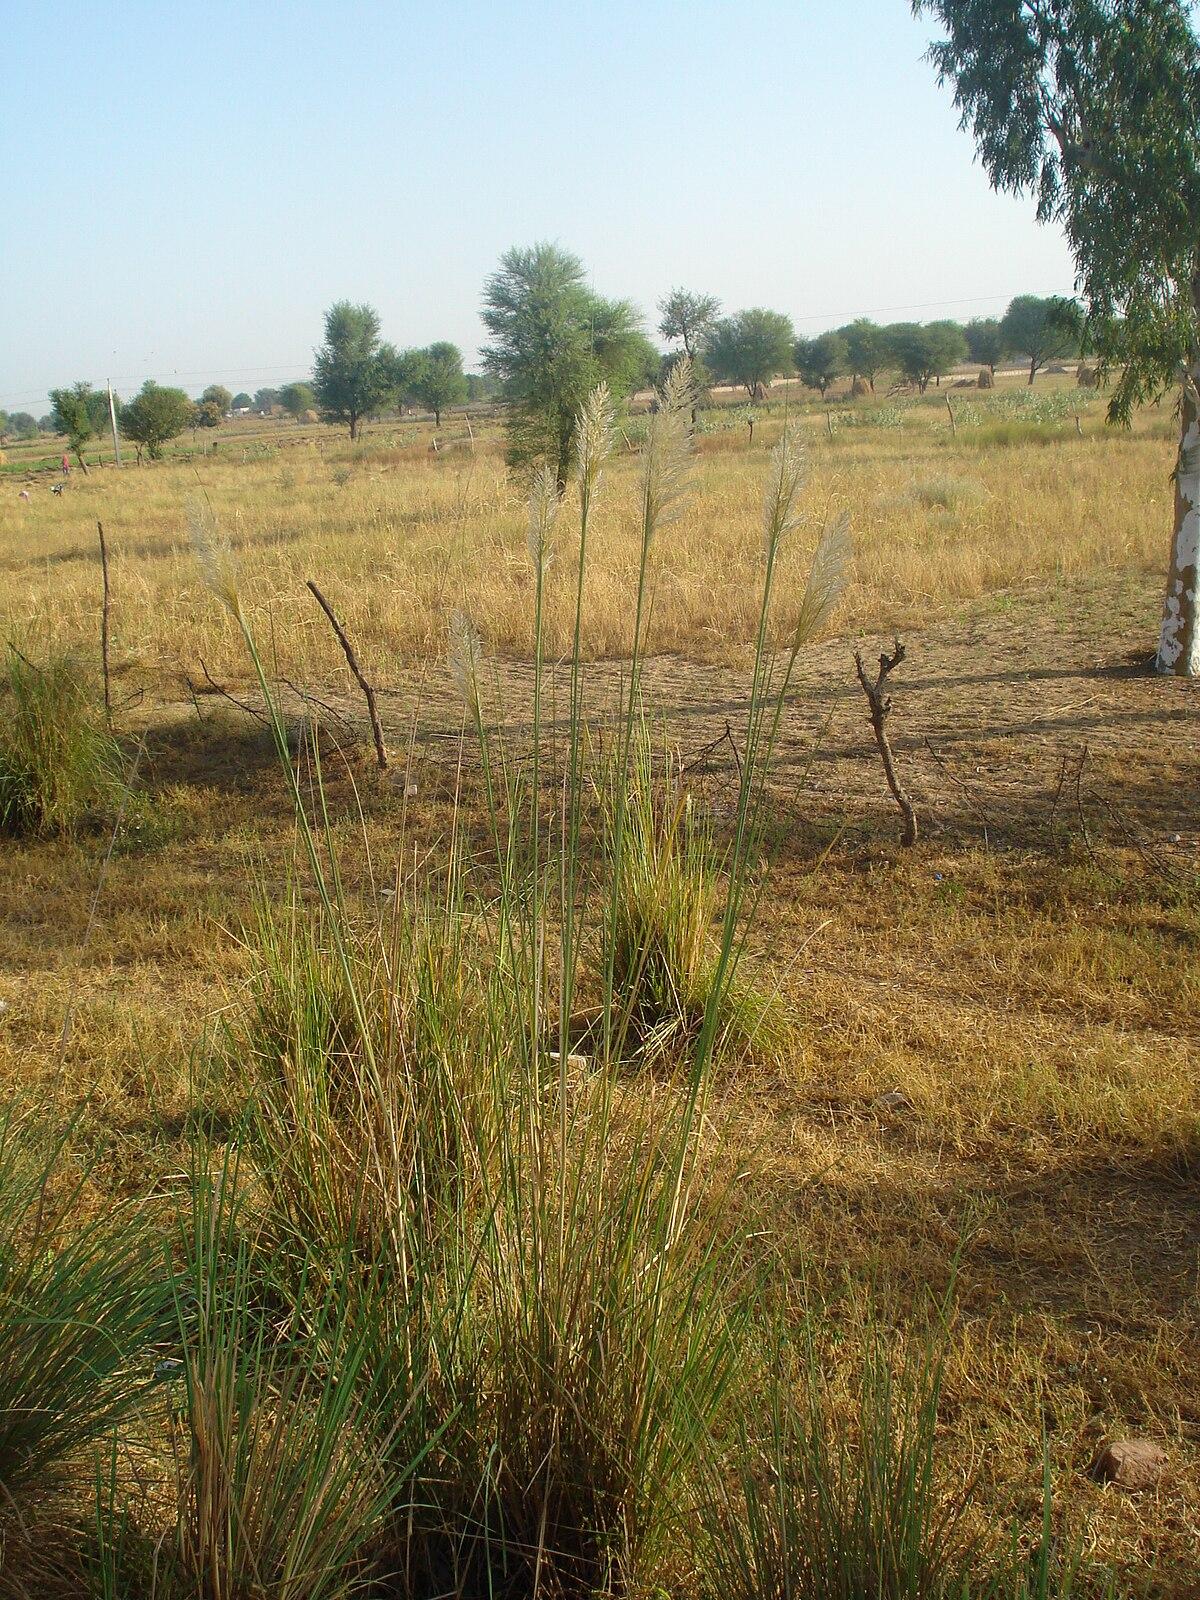 Saccharum munja wikipedia for Uses of soil wikipedia